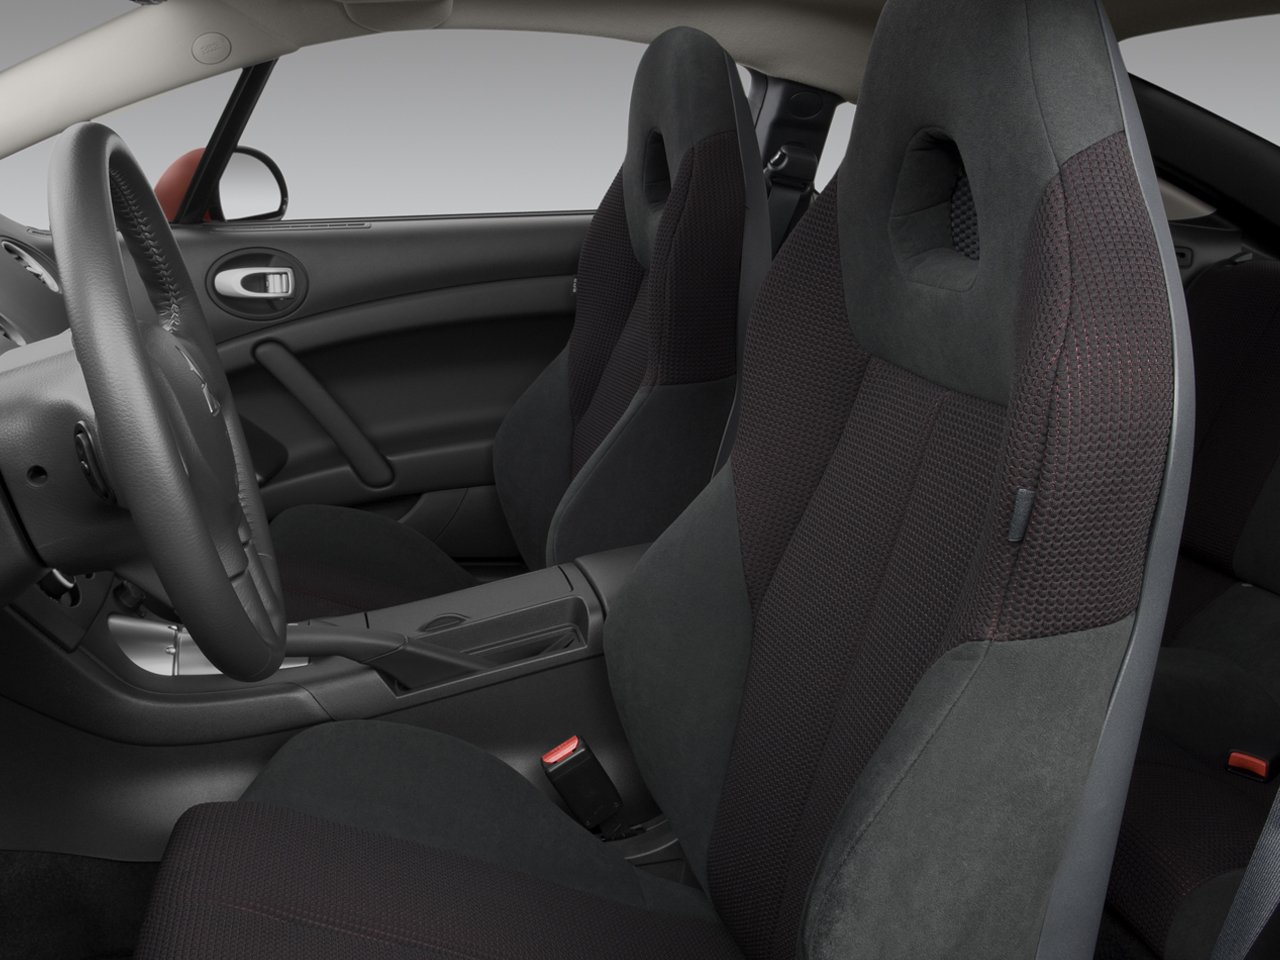 2009 Mitsubishi Eclipse - Latest news, Reviews, and Auto